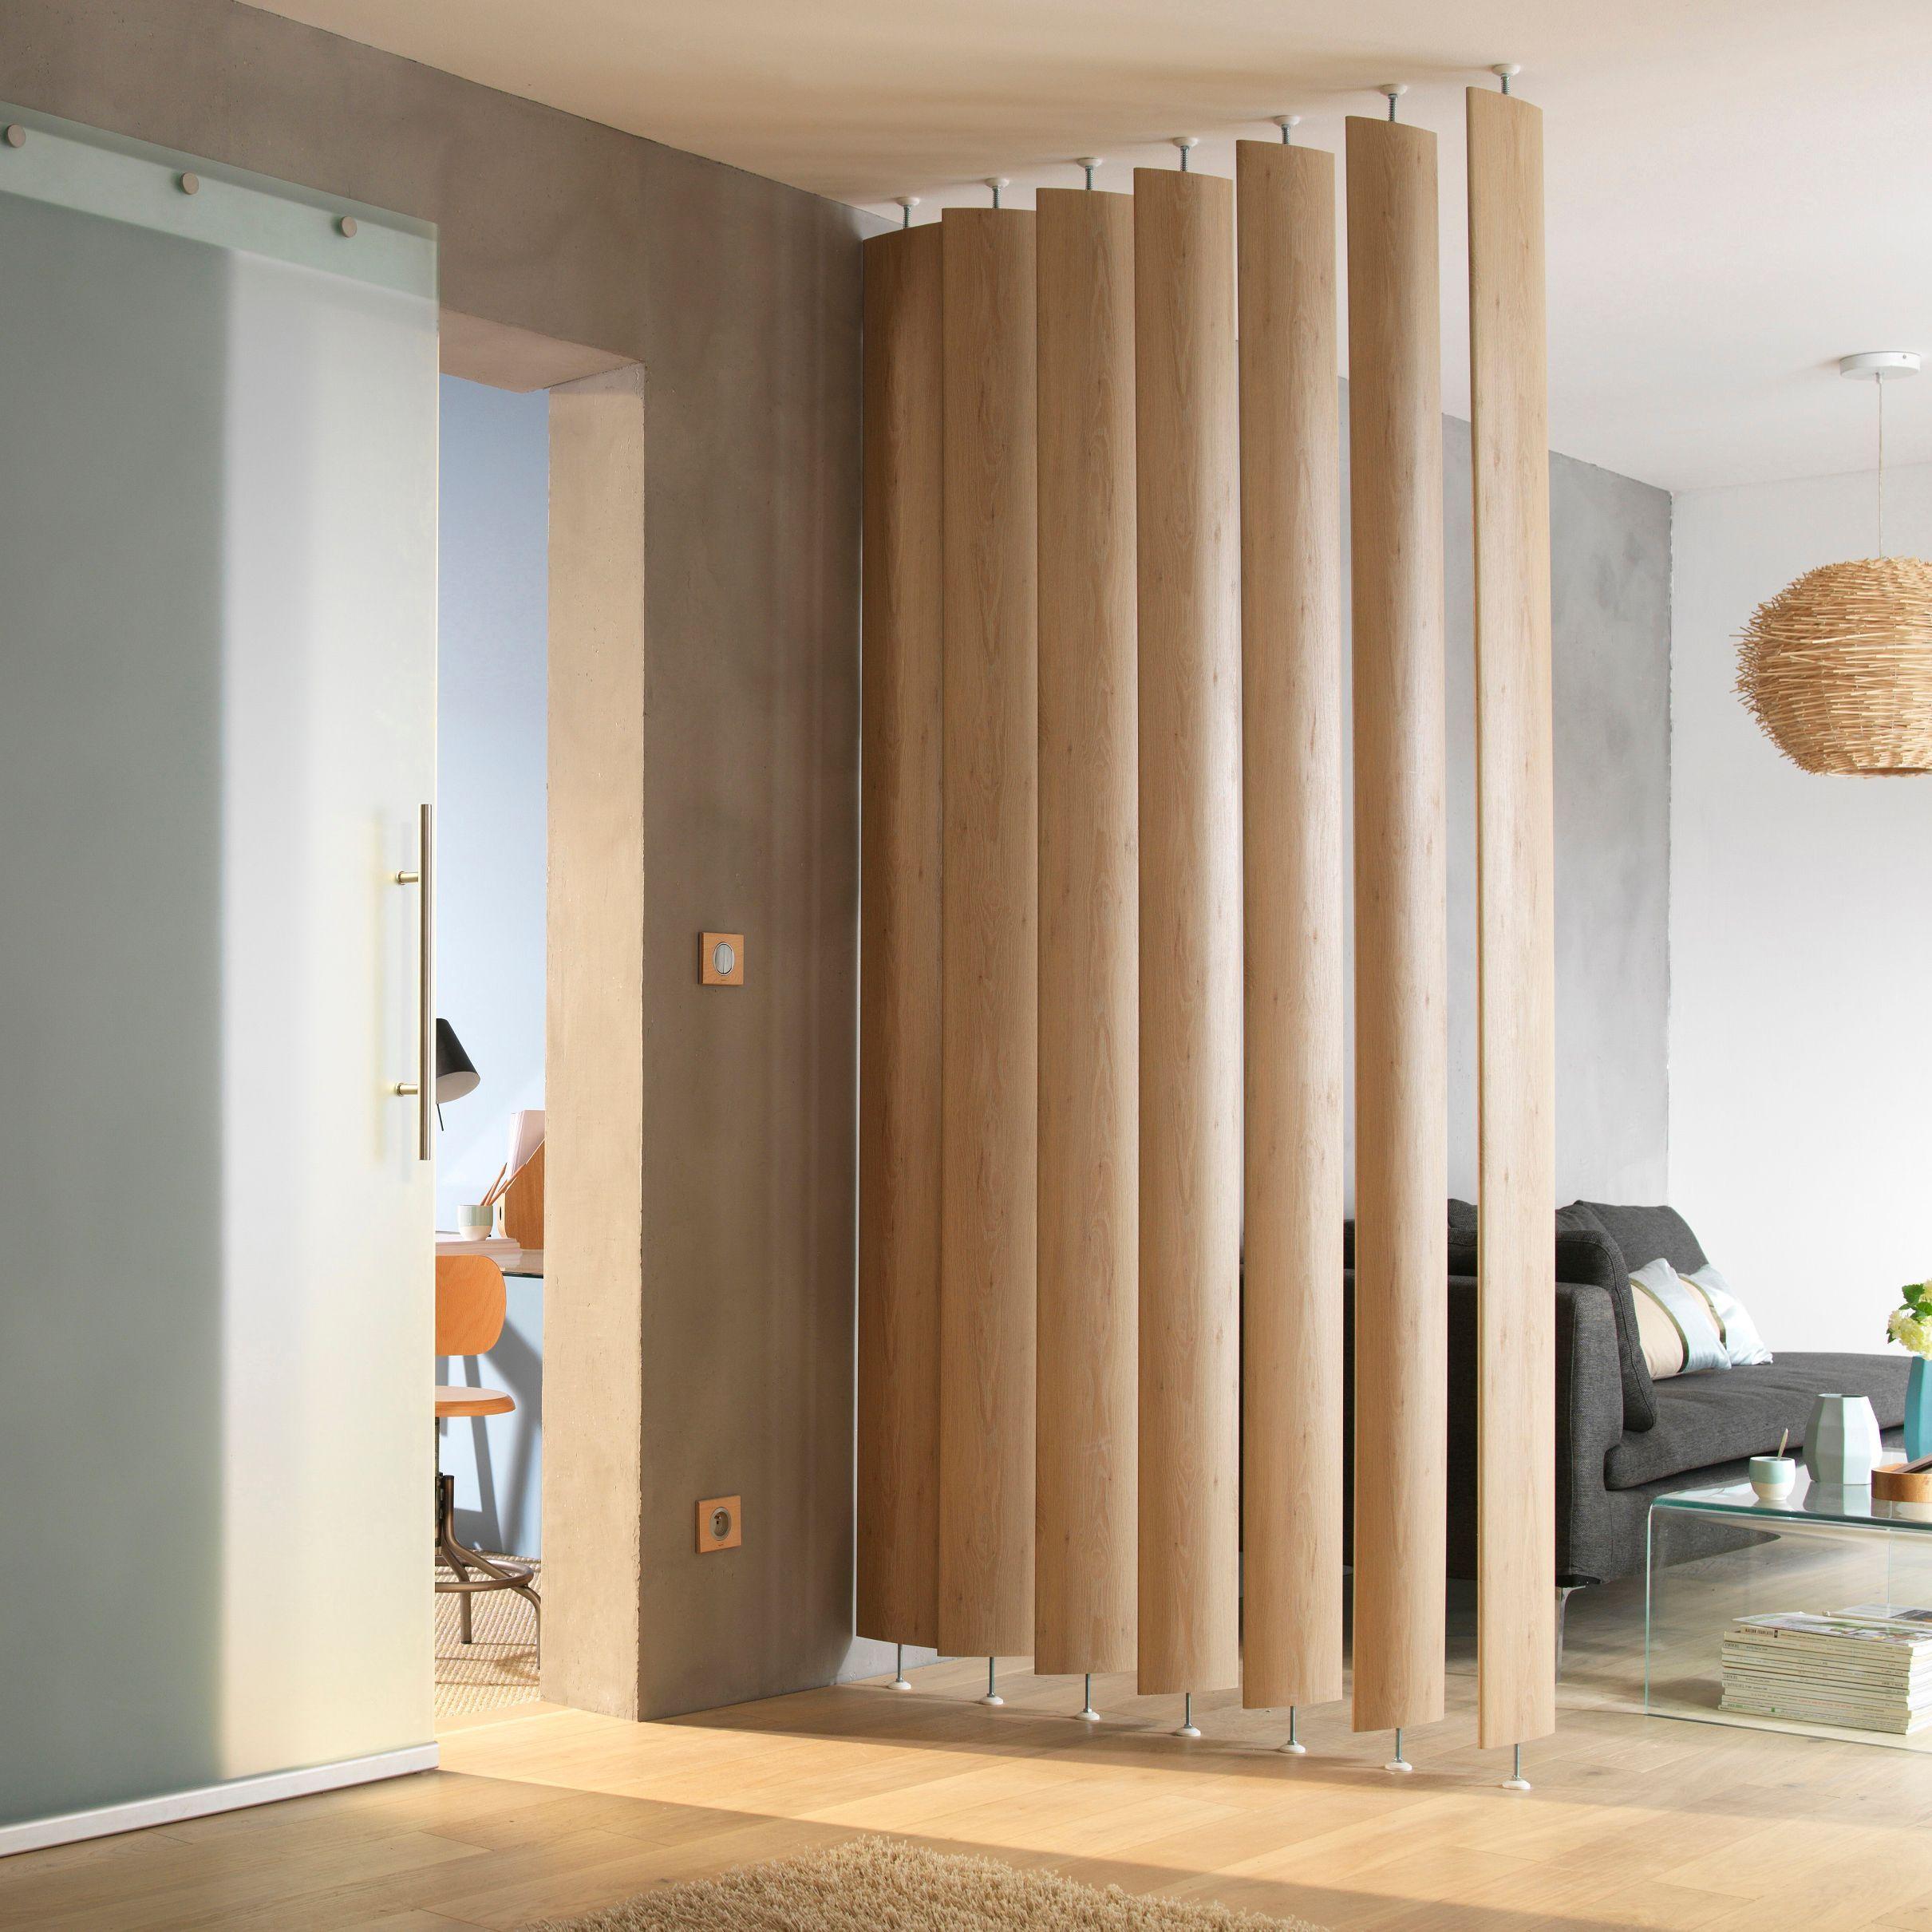 5397007202892 01i Room Divider Walls Wood Room Divider Room